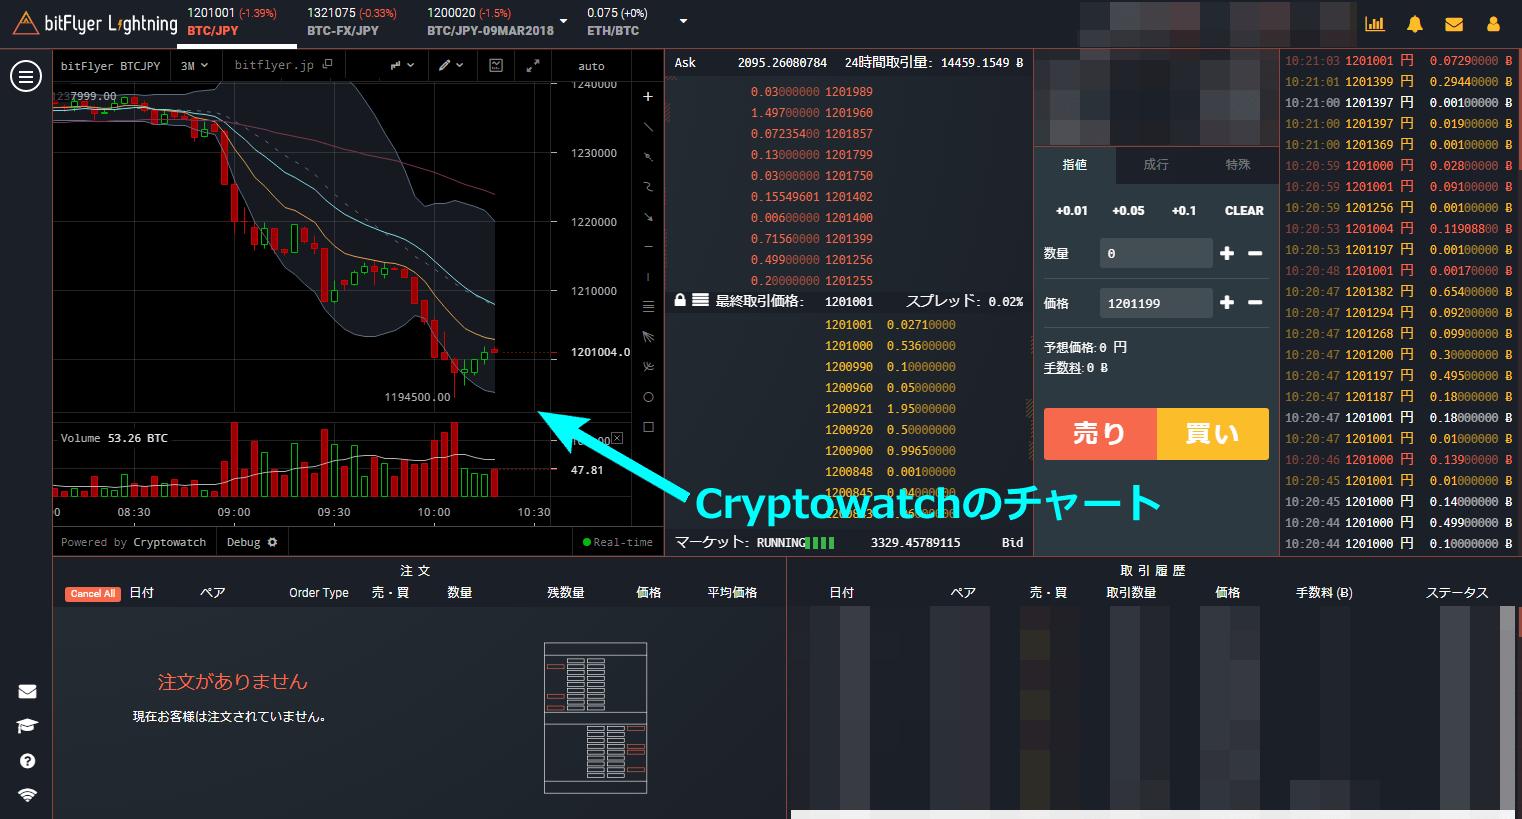 Cryptowatchのチャート